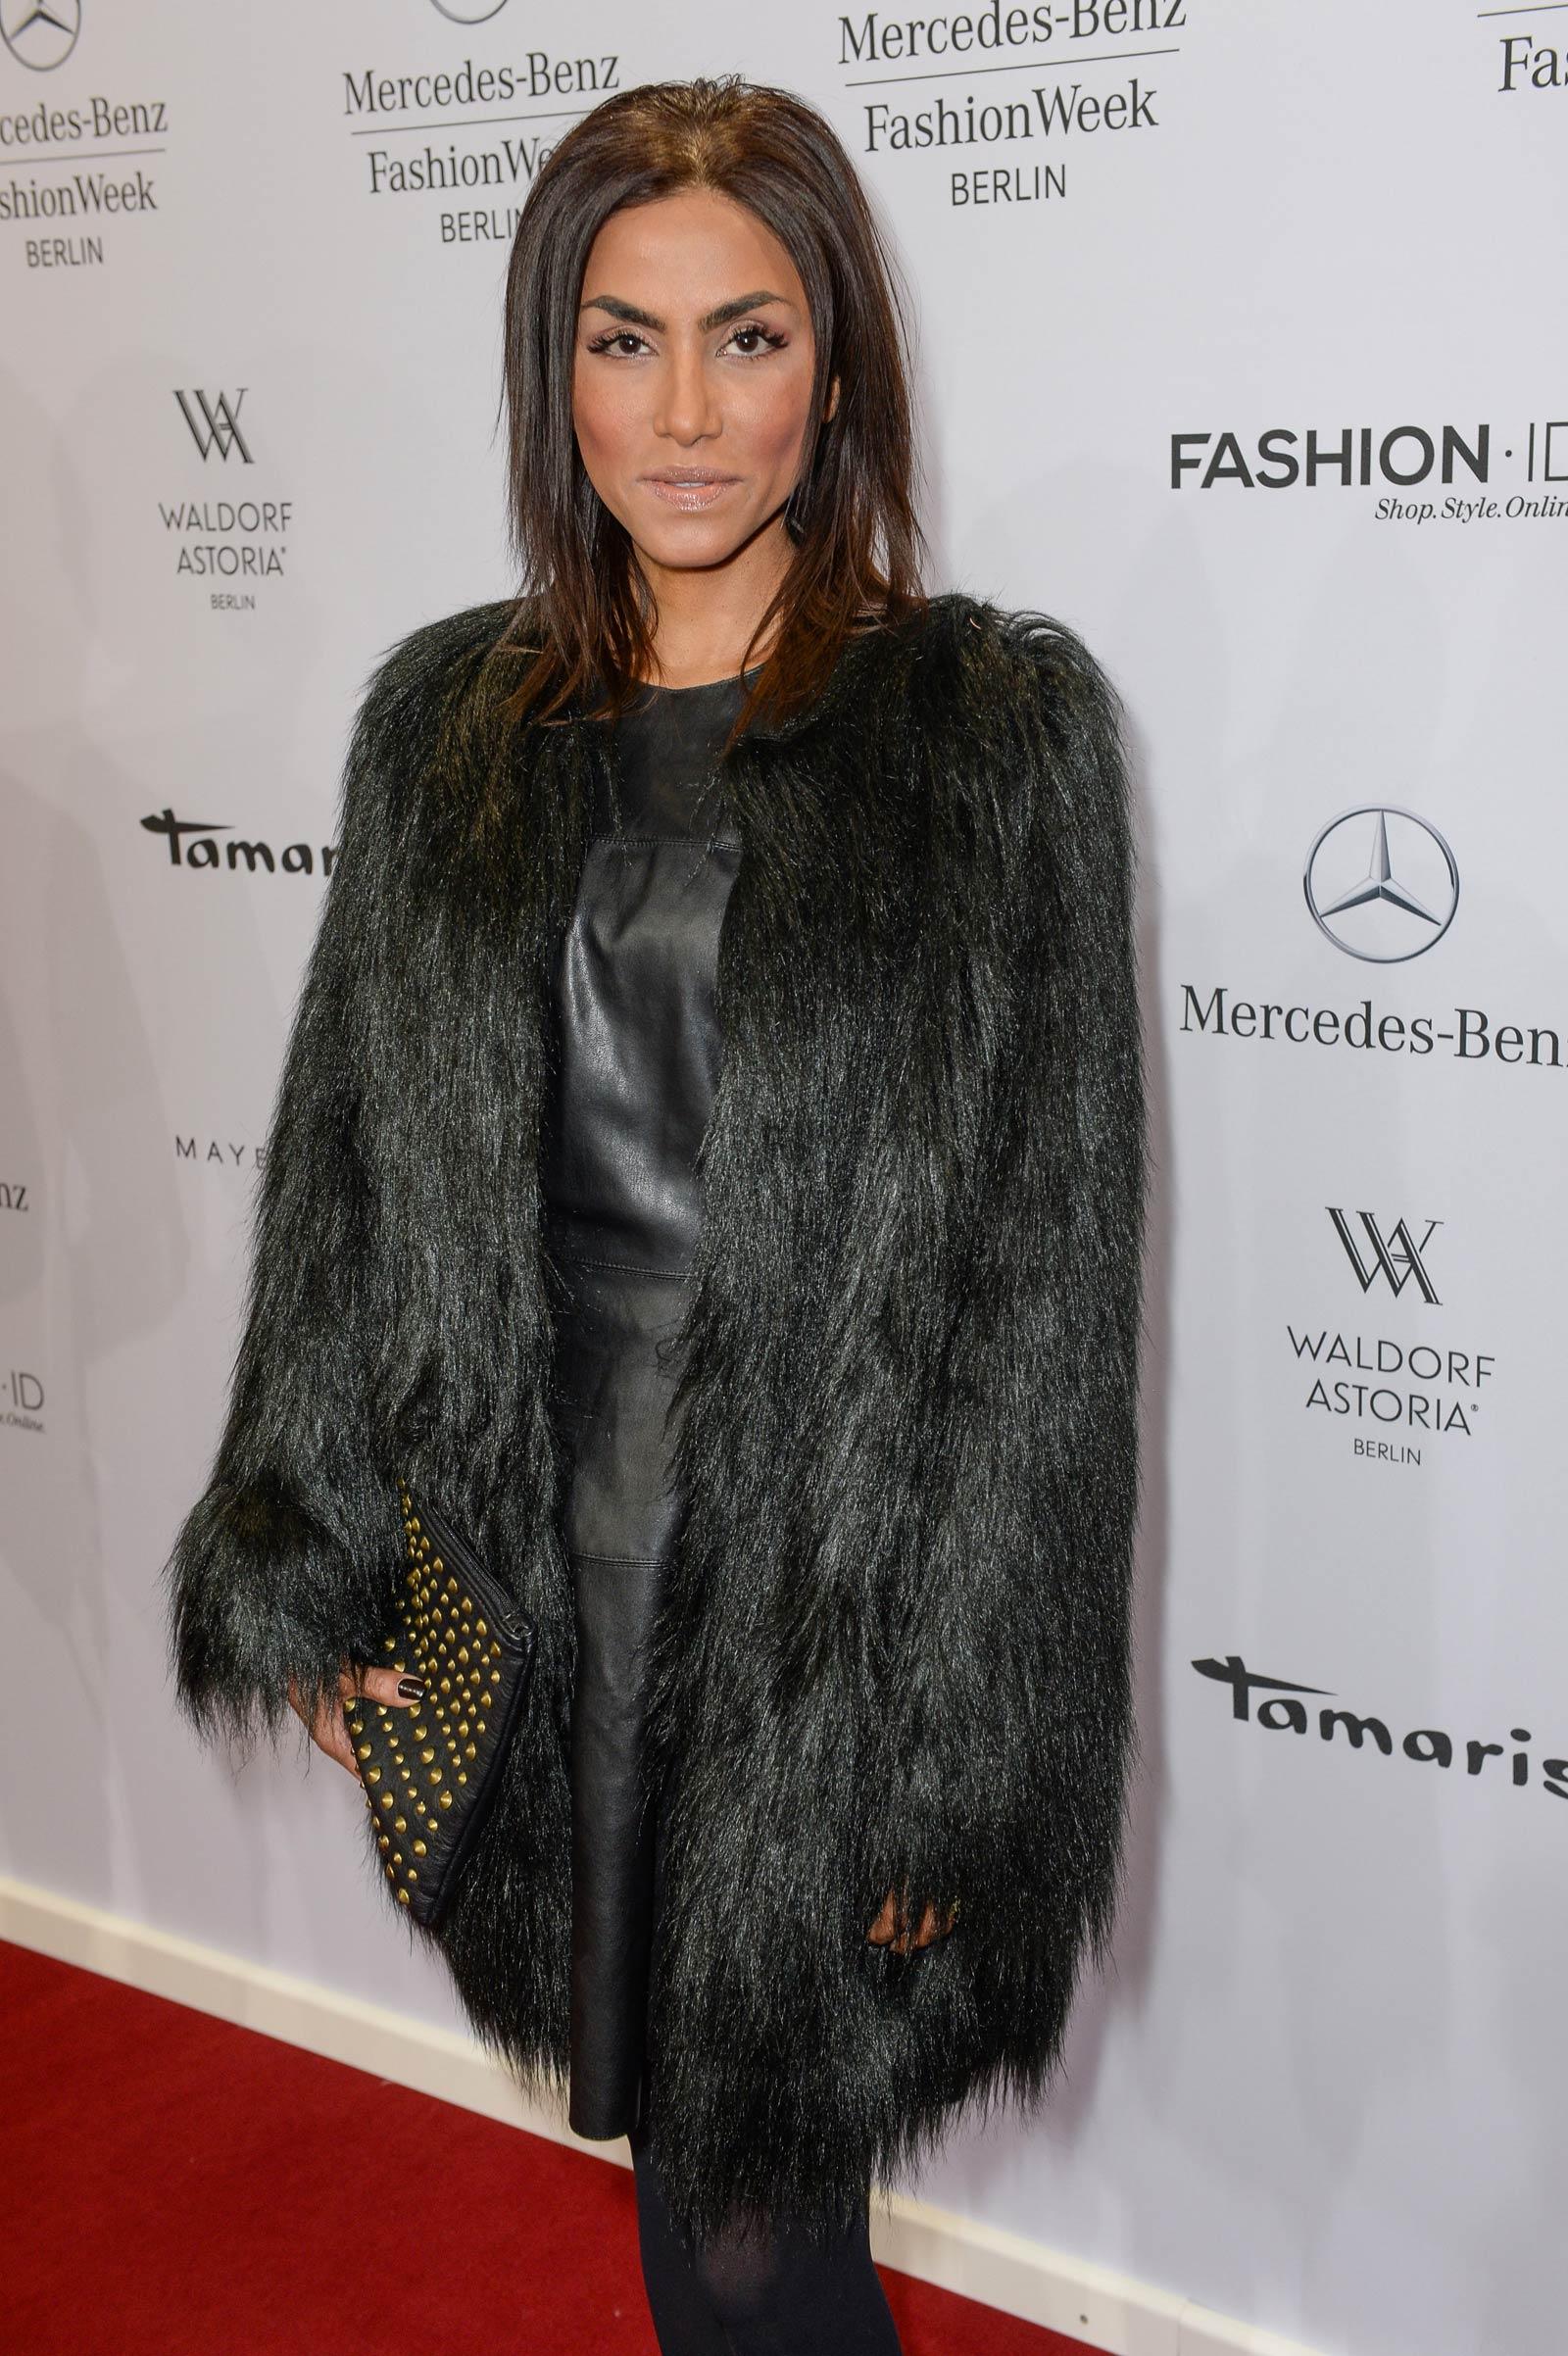 Sabrina Setlur attends Merceses Benz Fashion Week